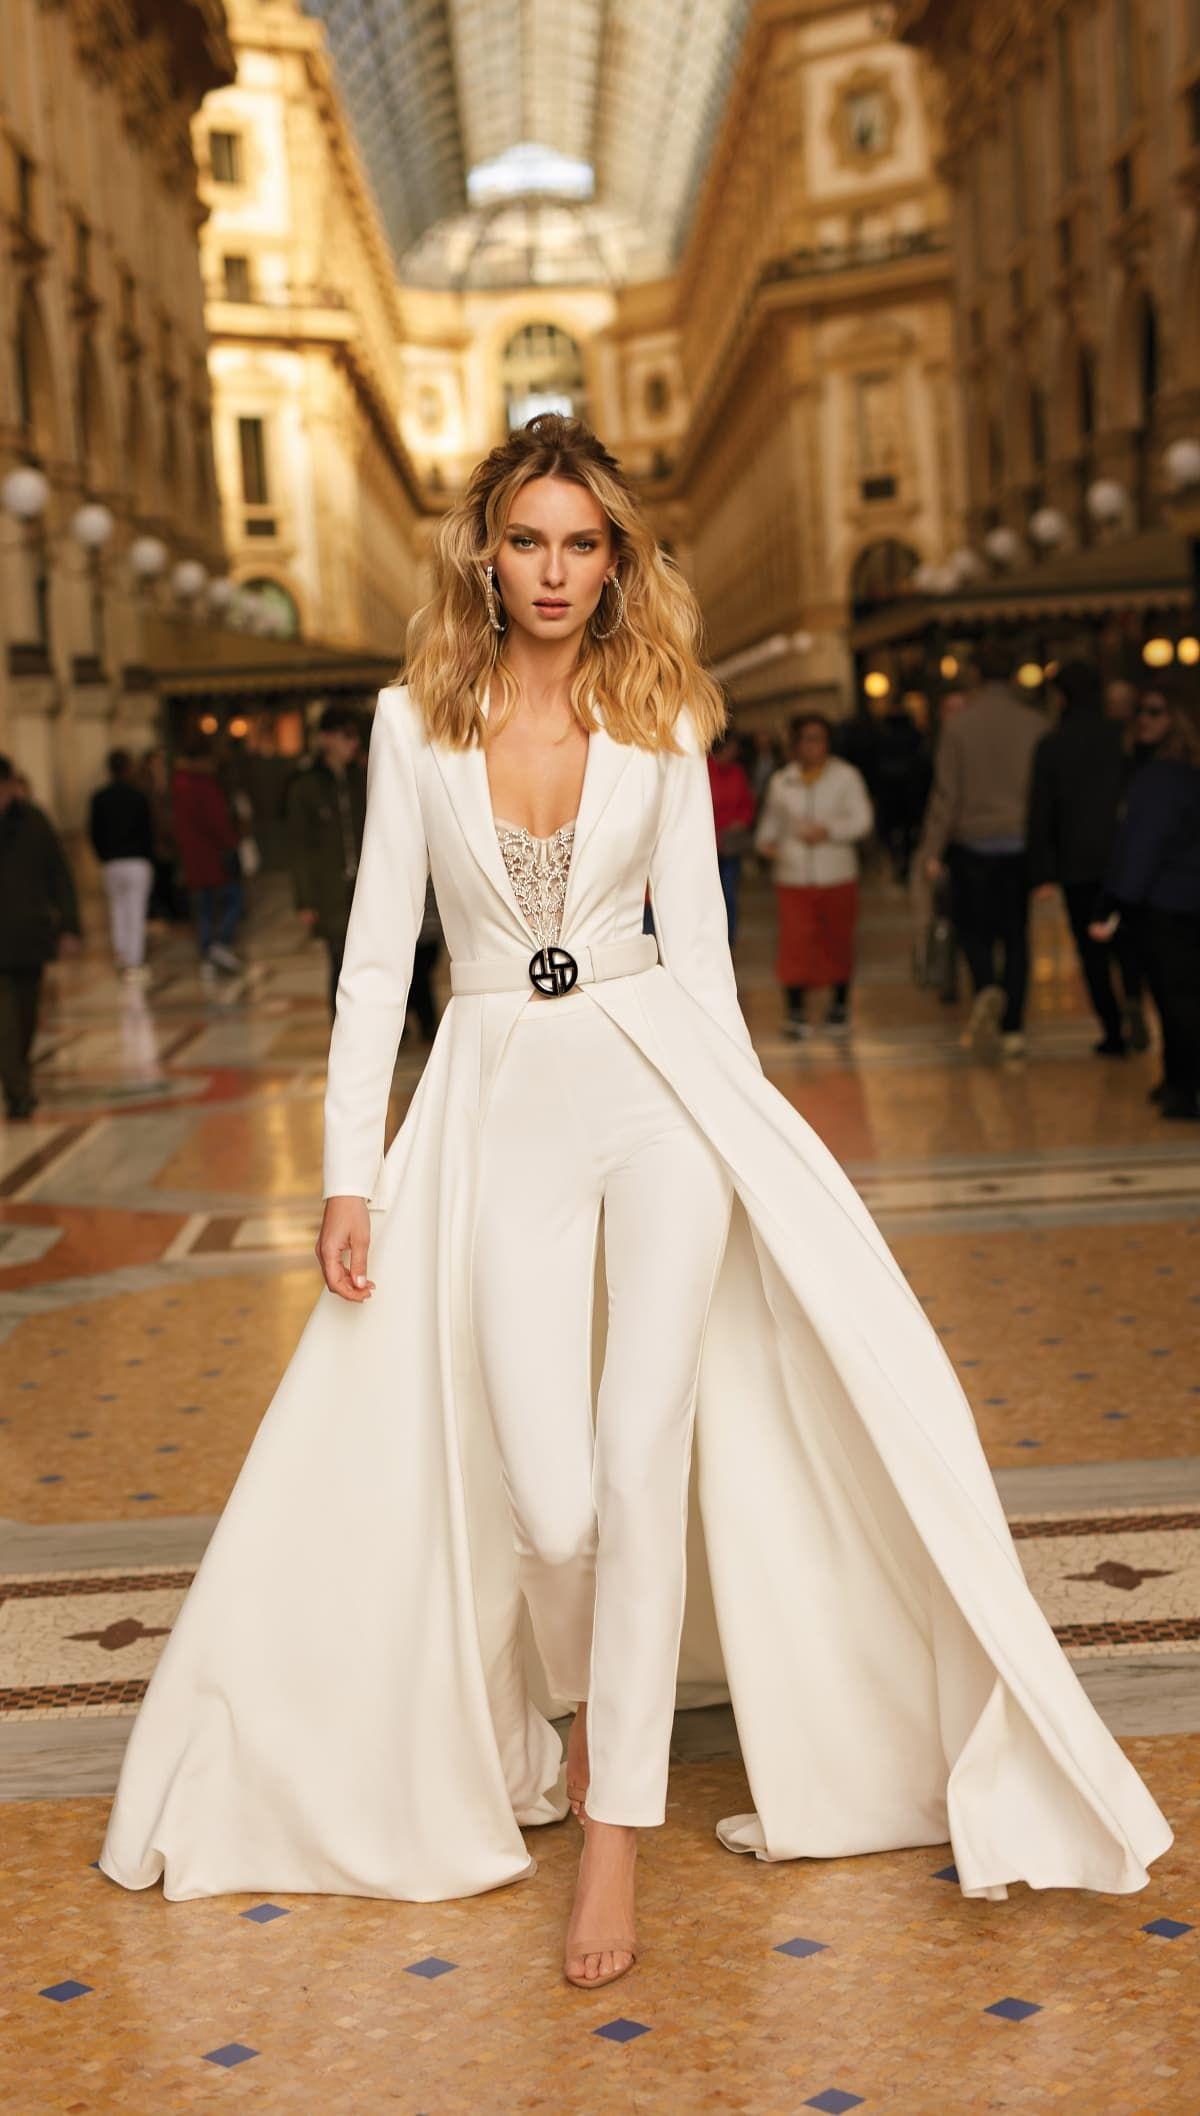 Berta Wedding Dresses 2020 Milano Collection Dress For The Wedding In 2020 Bridal Jumpsuit Wedding Pantsuit Wedding Jumpsuit